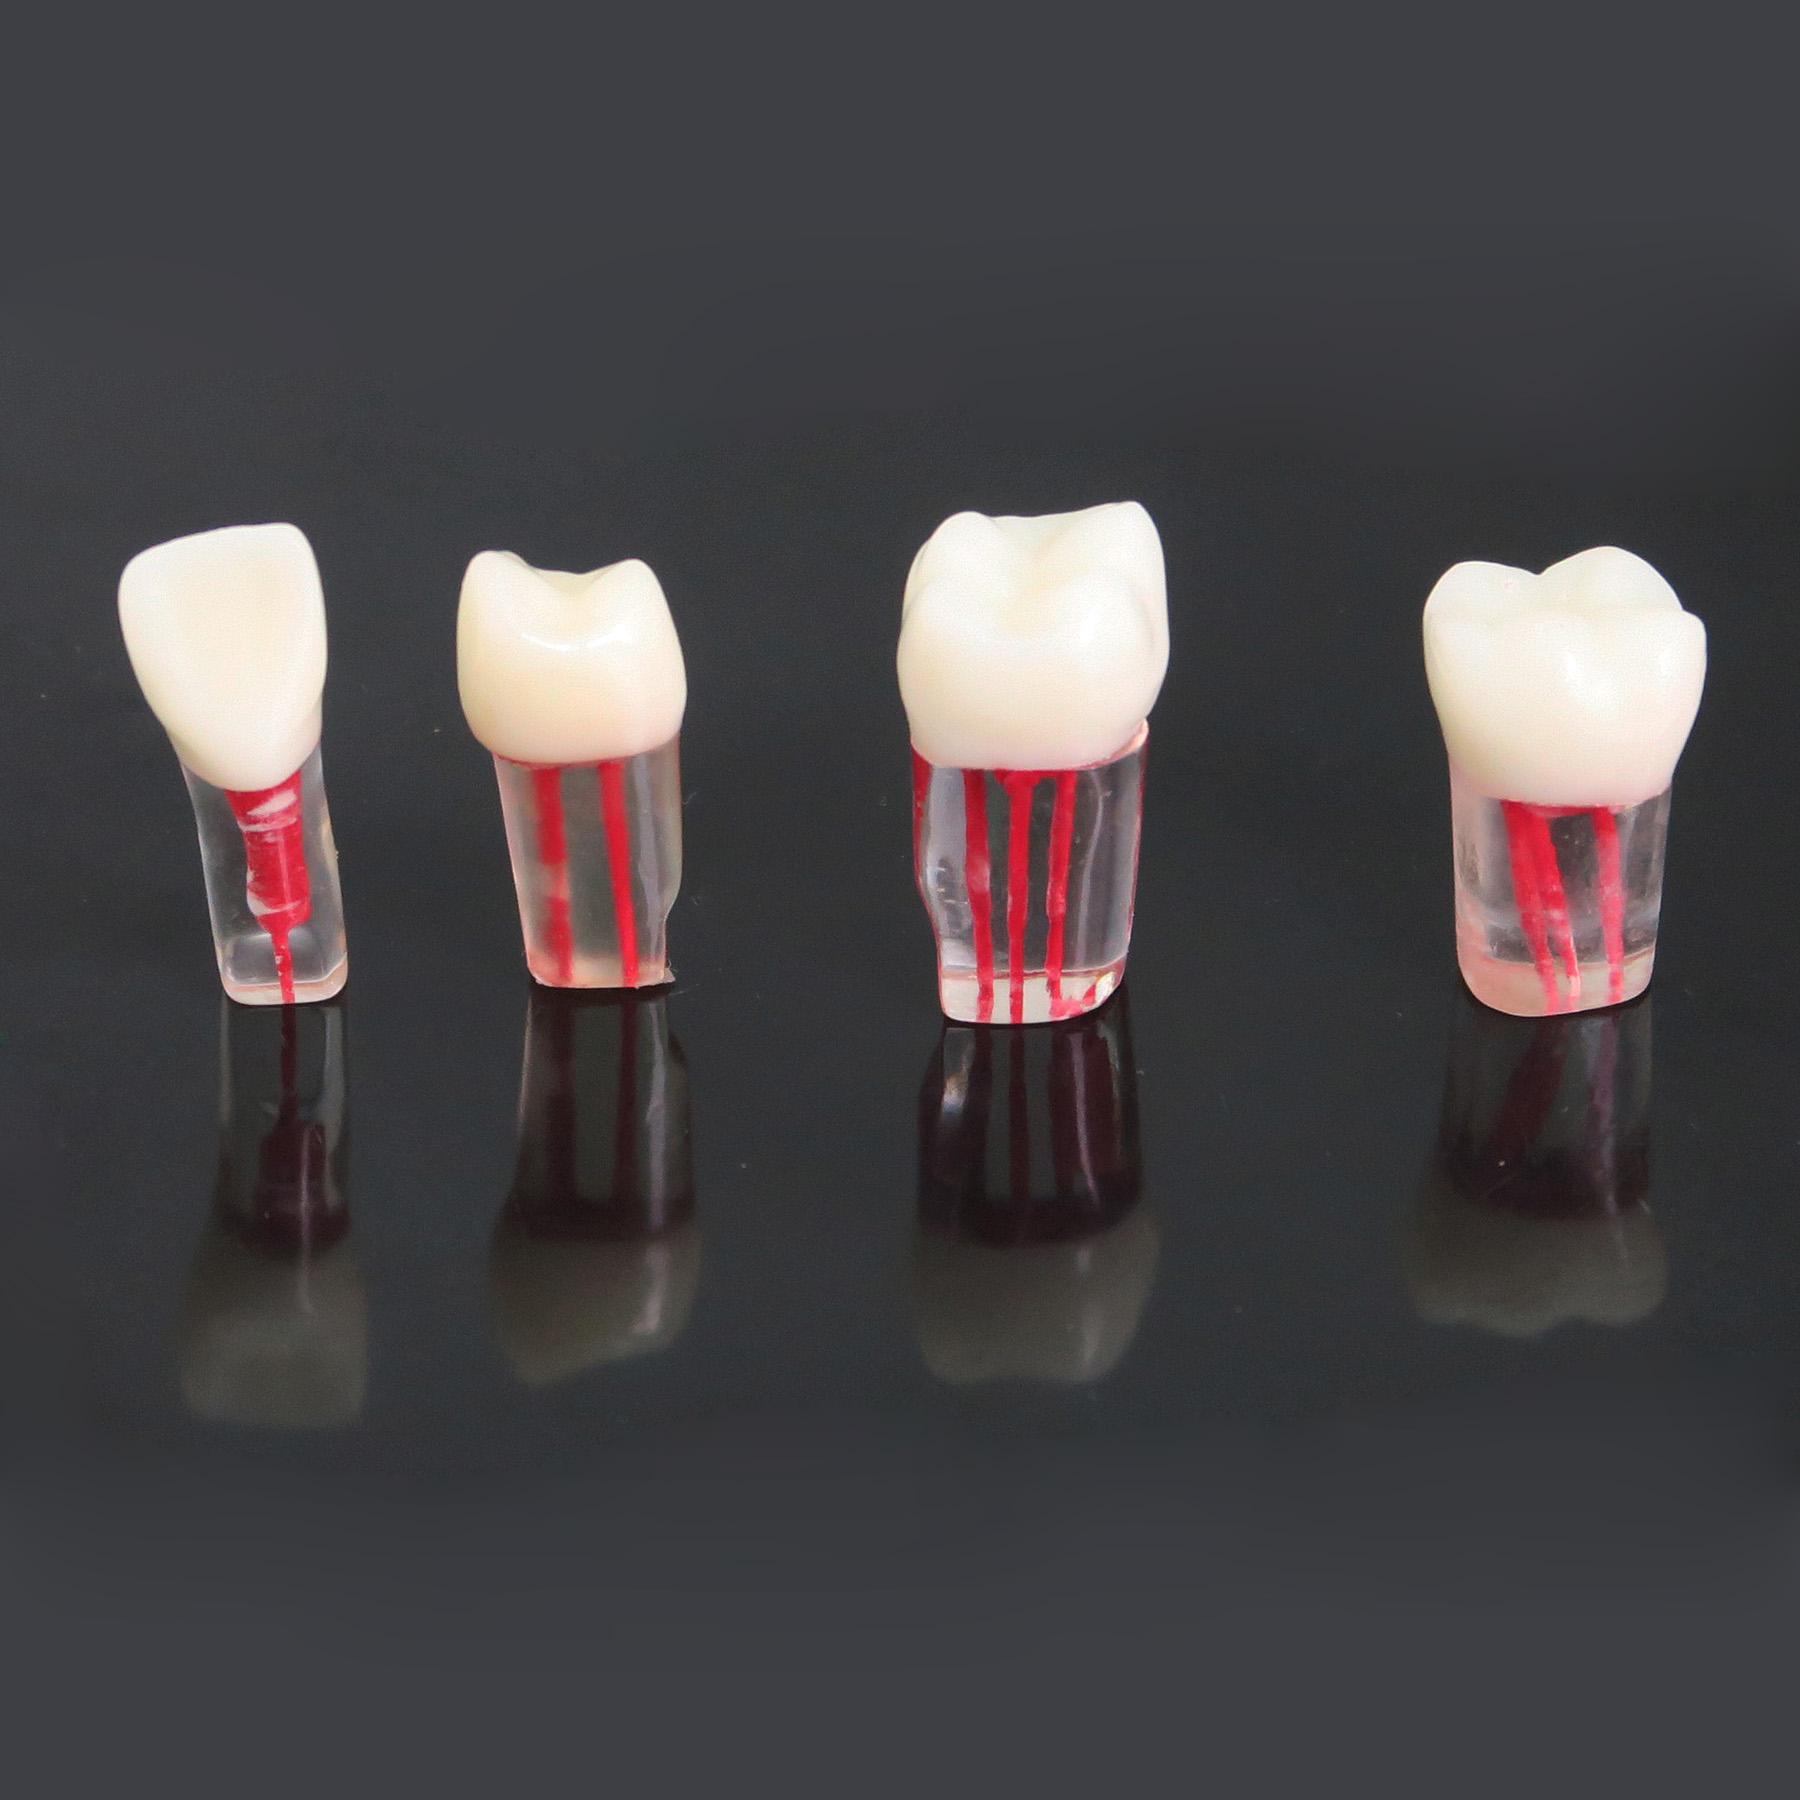 TM-N6 Dental Teeth Model Endo canal dental practice teeth Model Dentist Teach Study